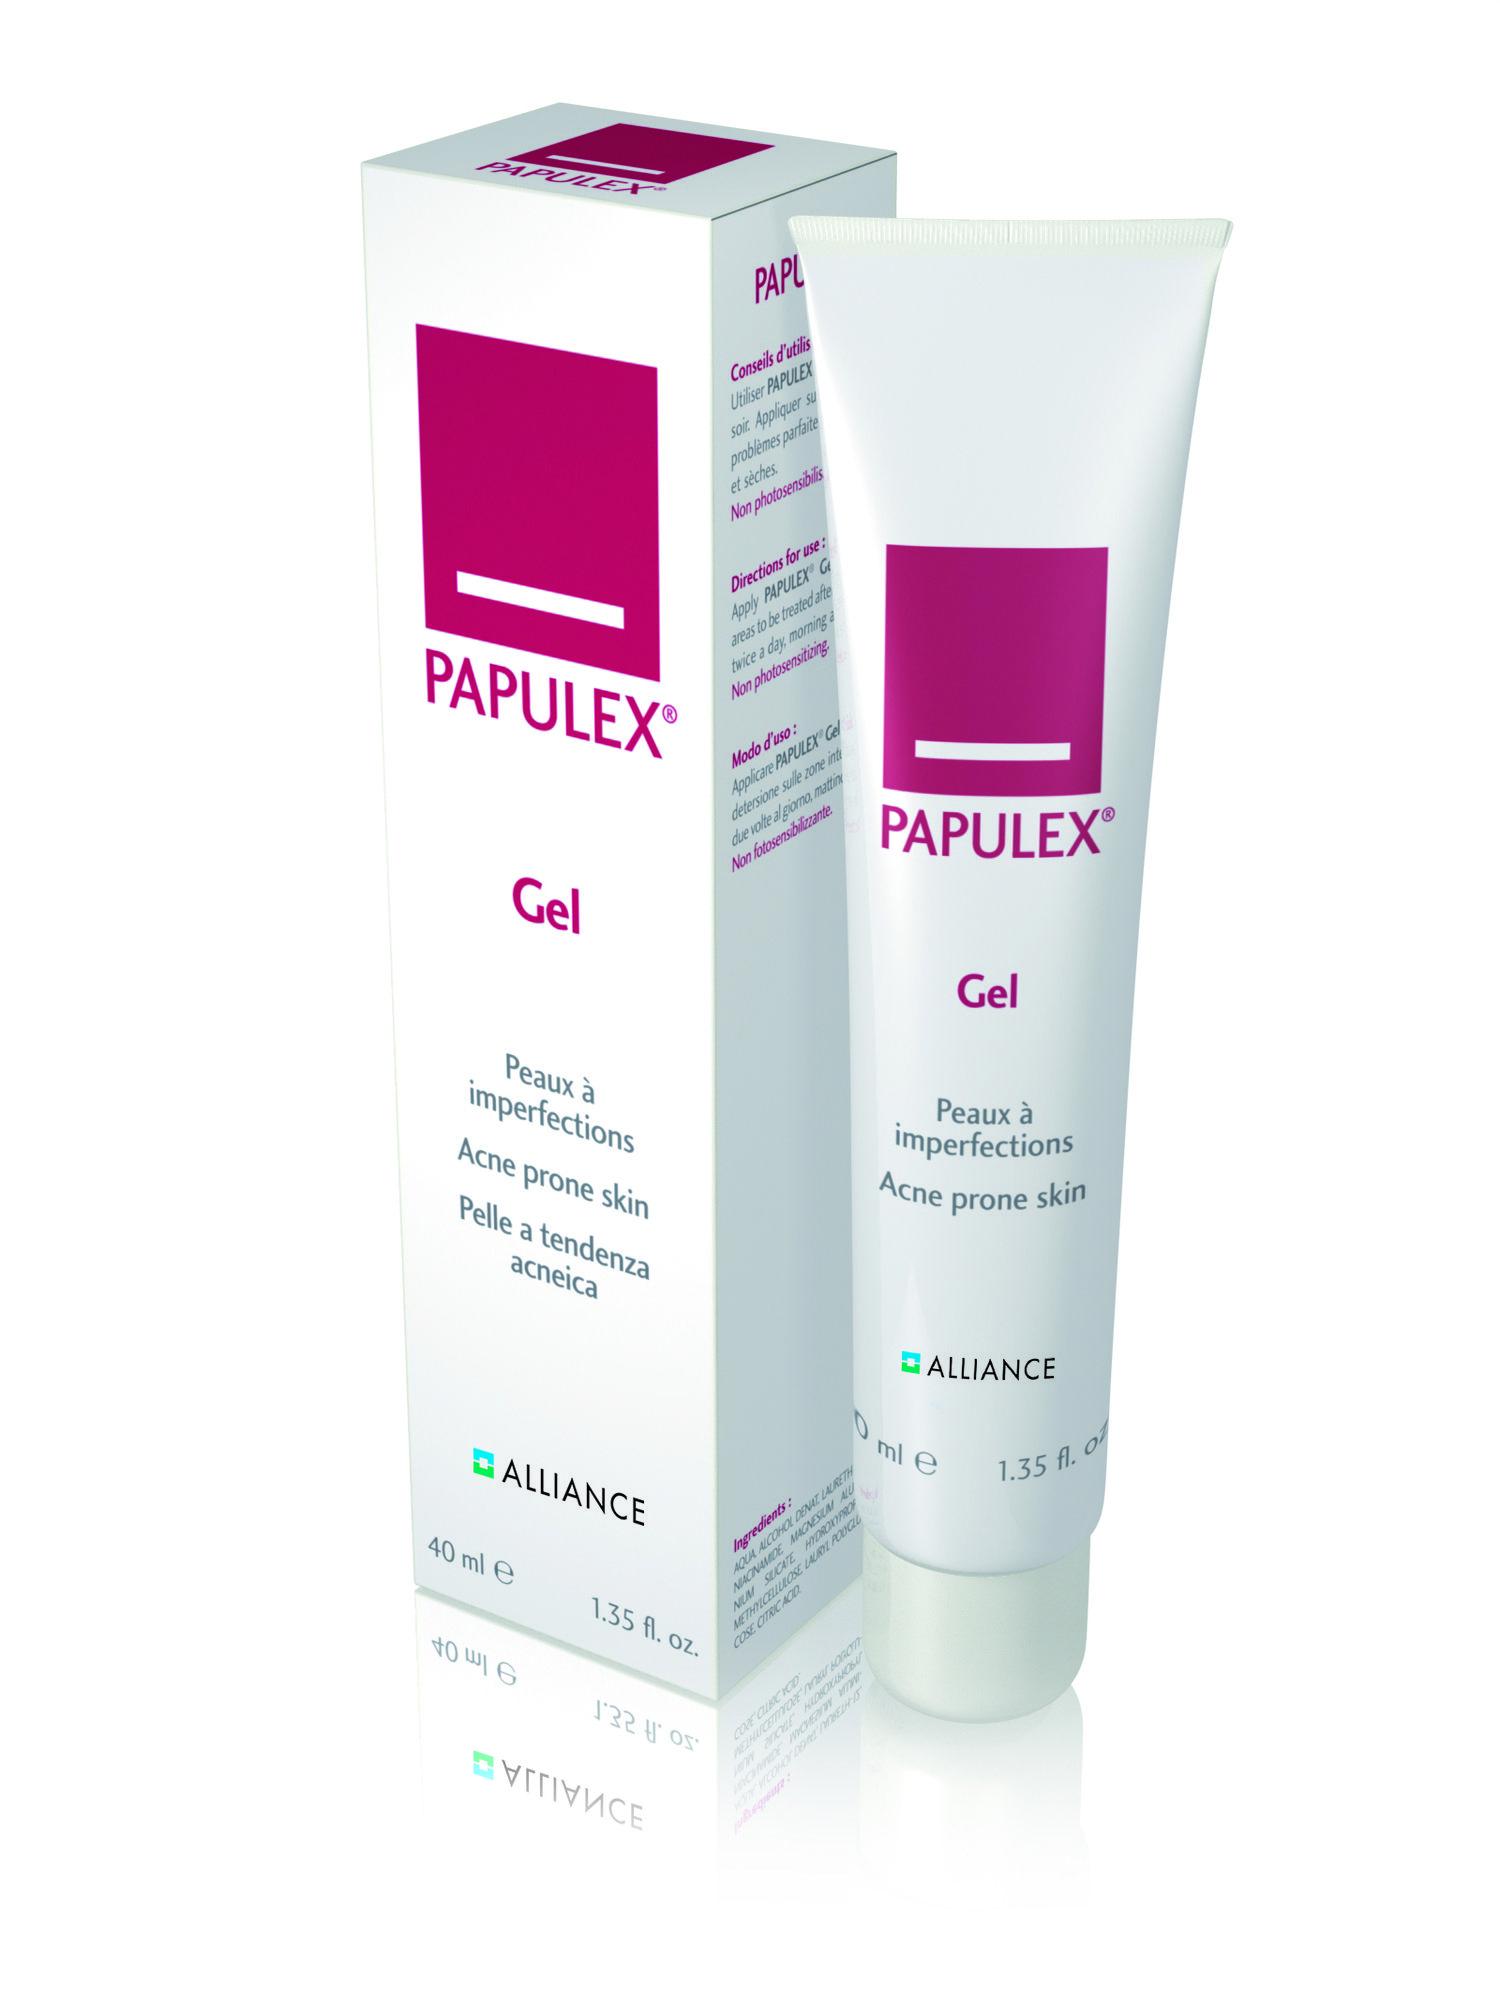 Papulex Gel Oslo Hudlegesenter Oslo Nettbutikk Onlineshop Oily Skin Fet Hud Oljete Hud Acne Acne Prone Skin Uren Hud Skincare Products Sales Dermat